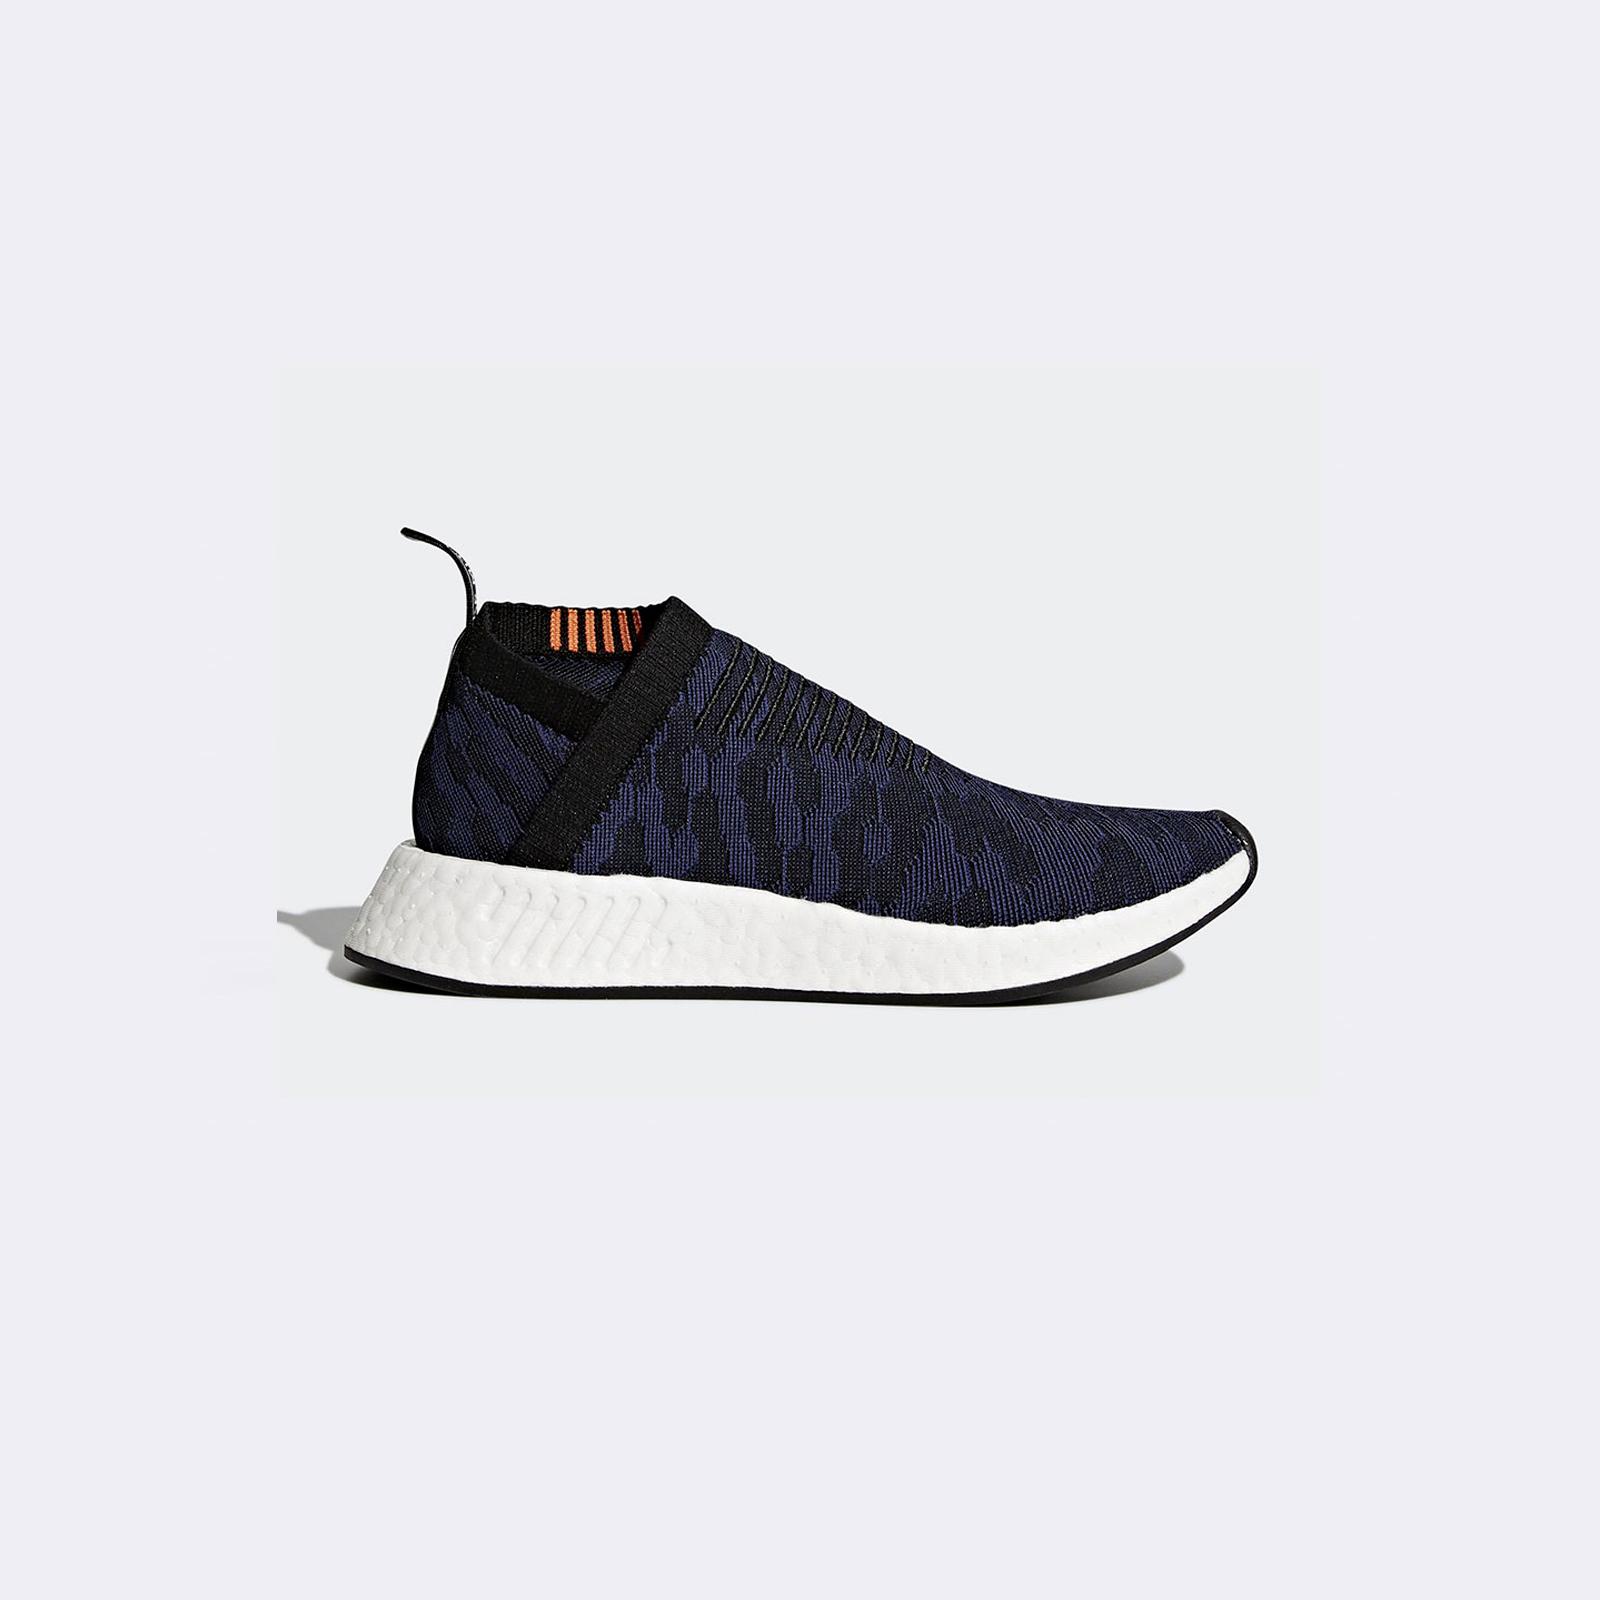 adidas NMD CS2 PK W Cq2038 Sneakersnstuff | sneakers